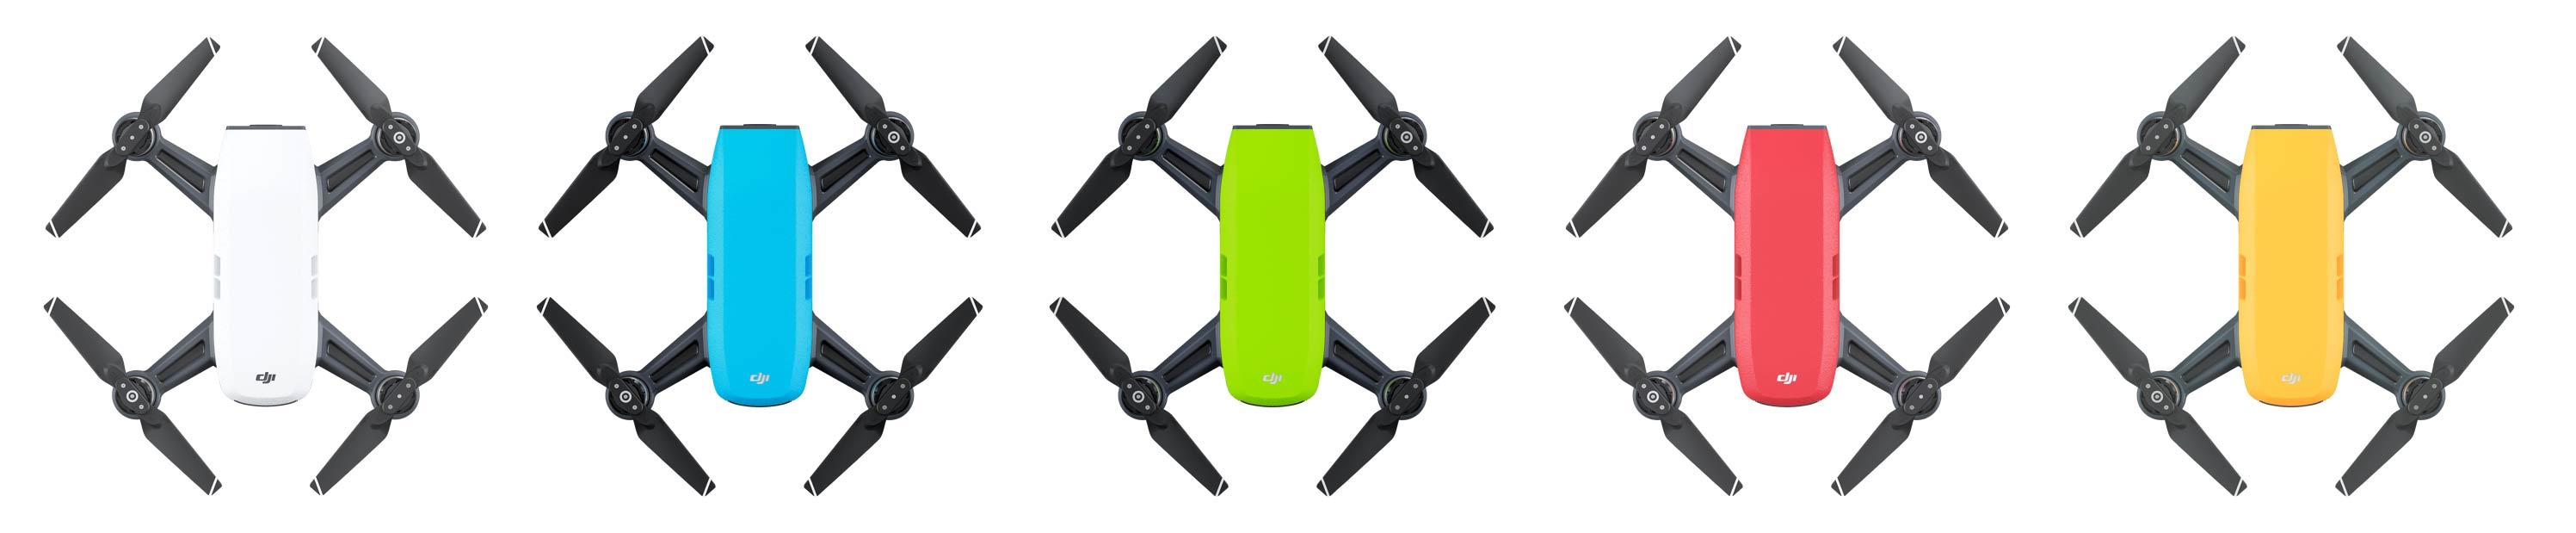 jual-dji-spark-indonesia-jakarta-ready-stock-indonesia-drone-mini-murah-original-dealer-resmi